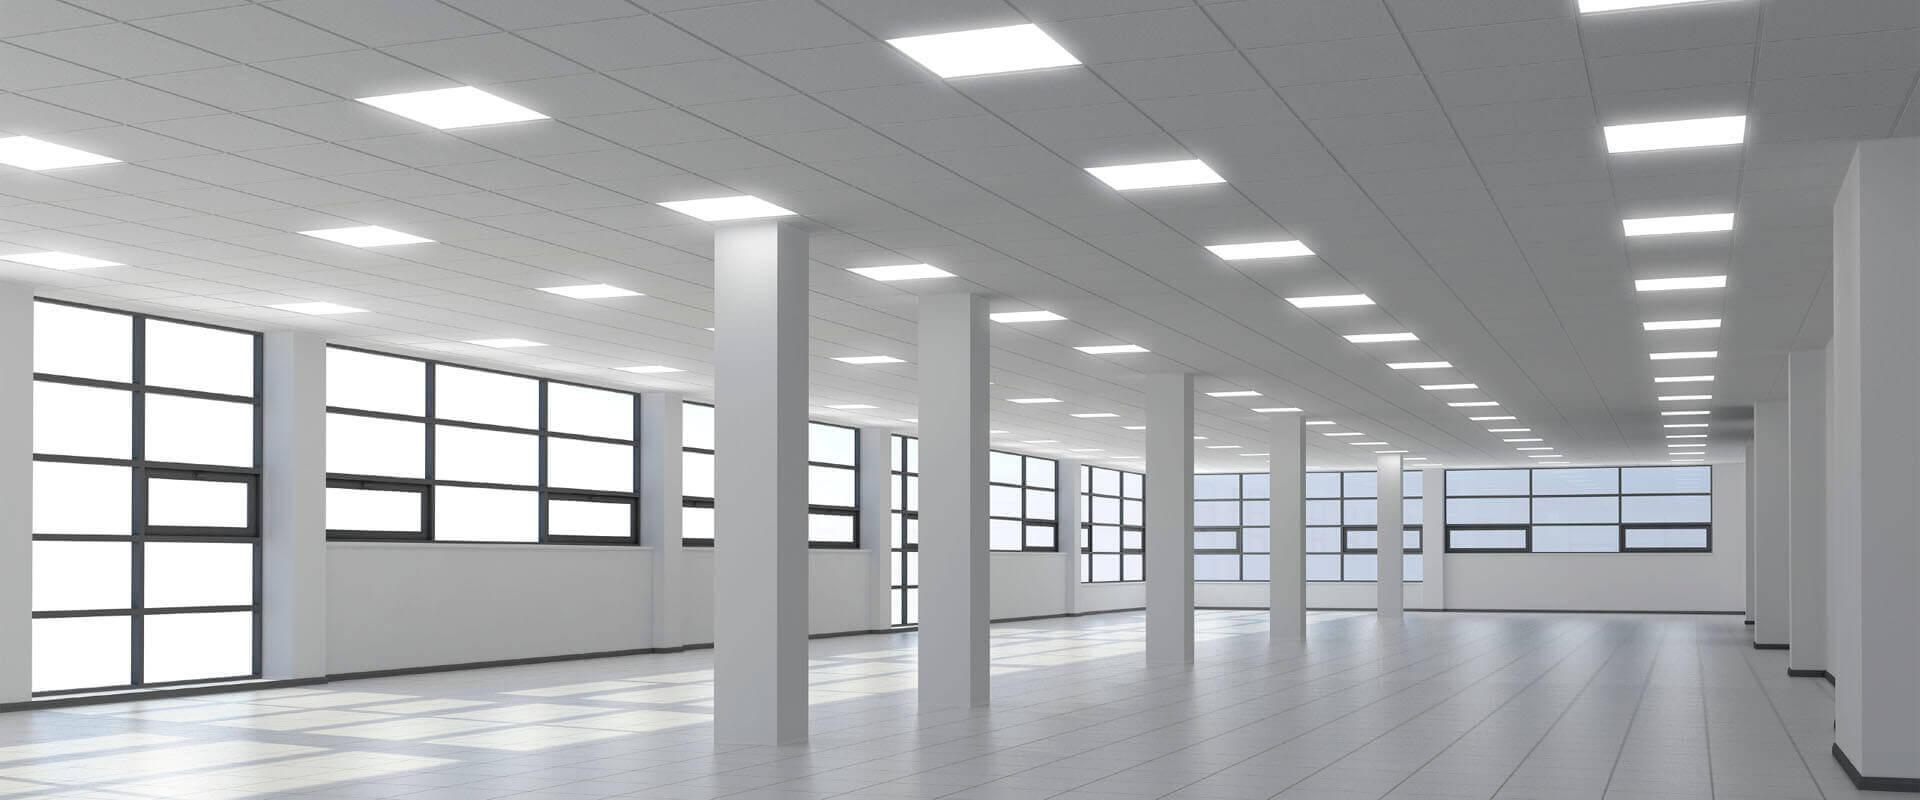 LED lighting servcies in Essex